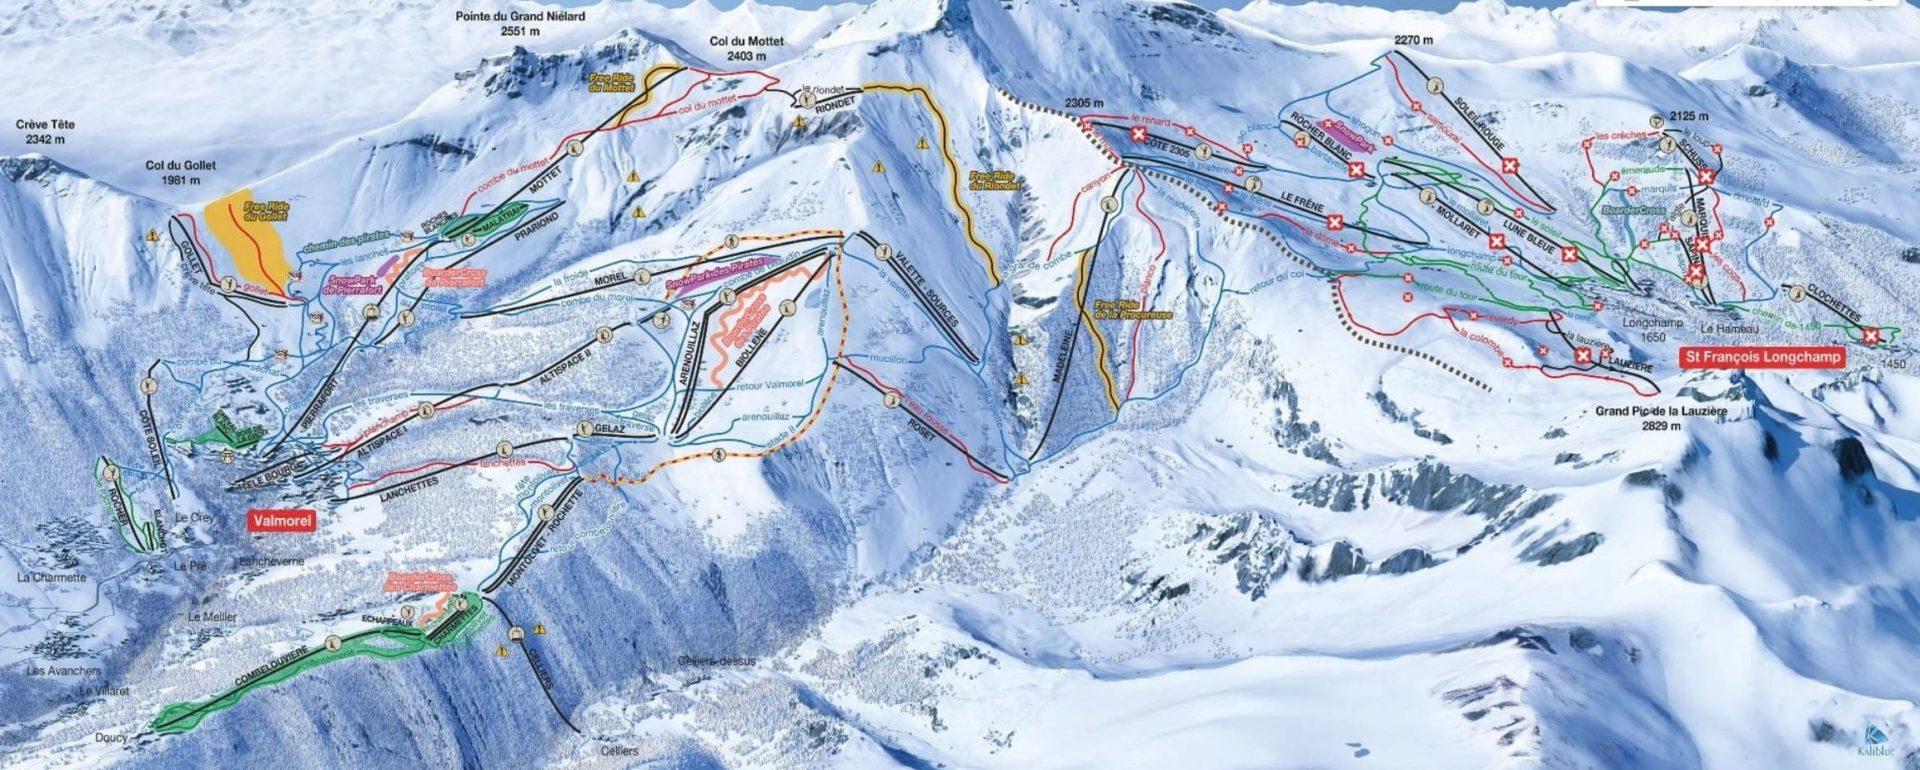 Pisteplattegrond Le Grand Domaine Frankrijk Valmorel St François de Longchamp wintersport skivakantie luxe